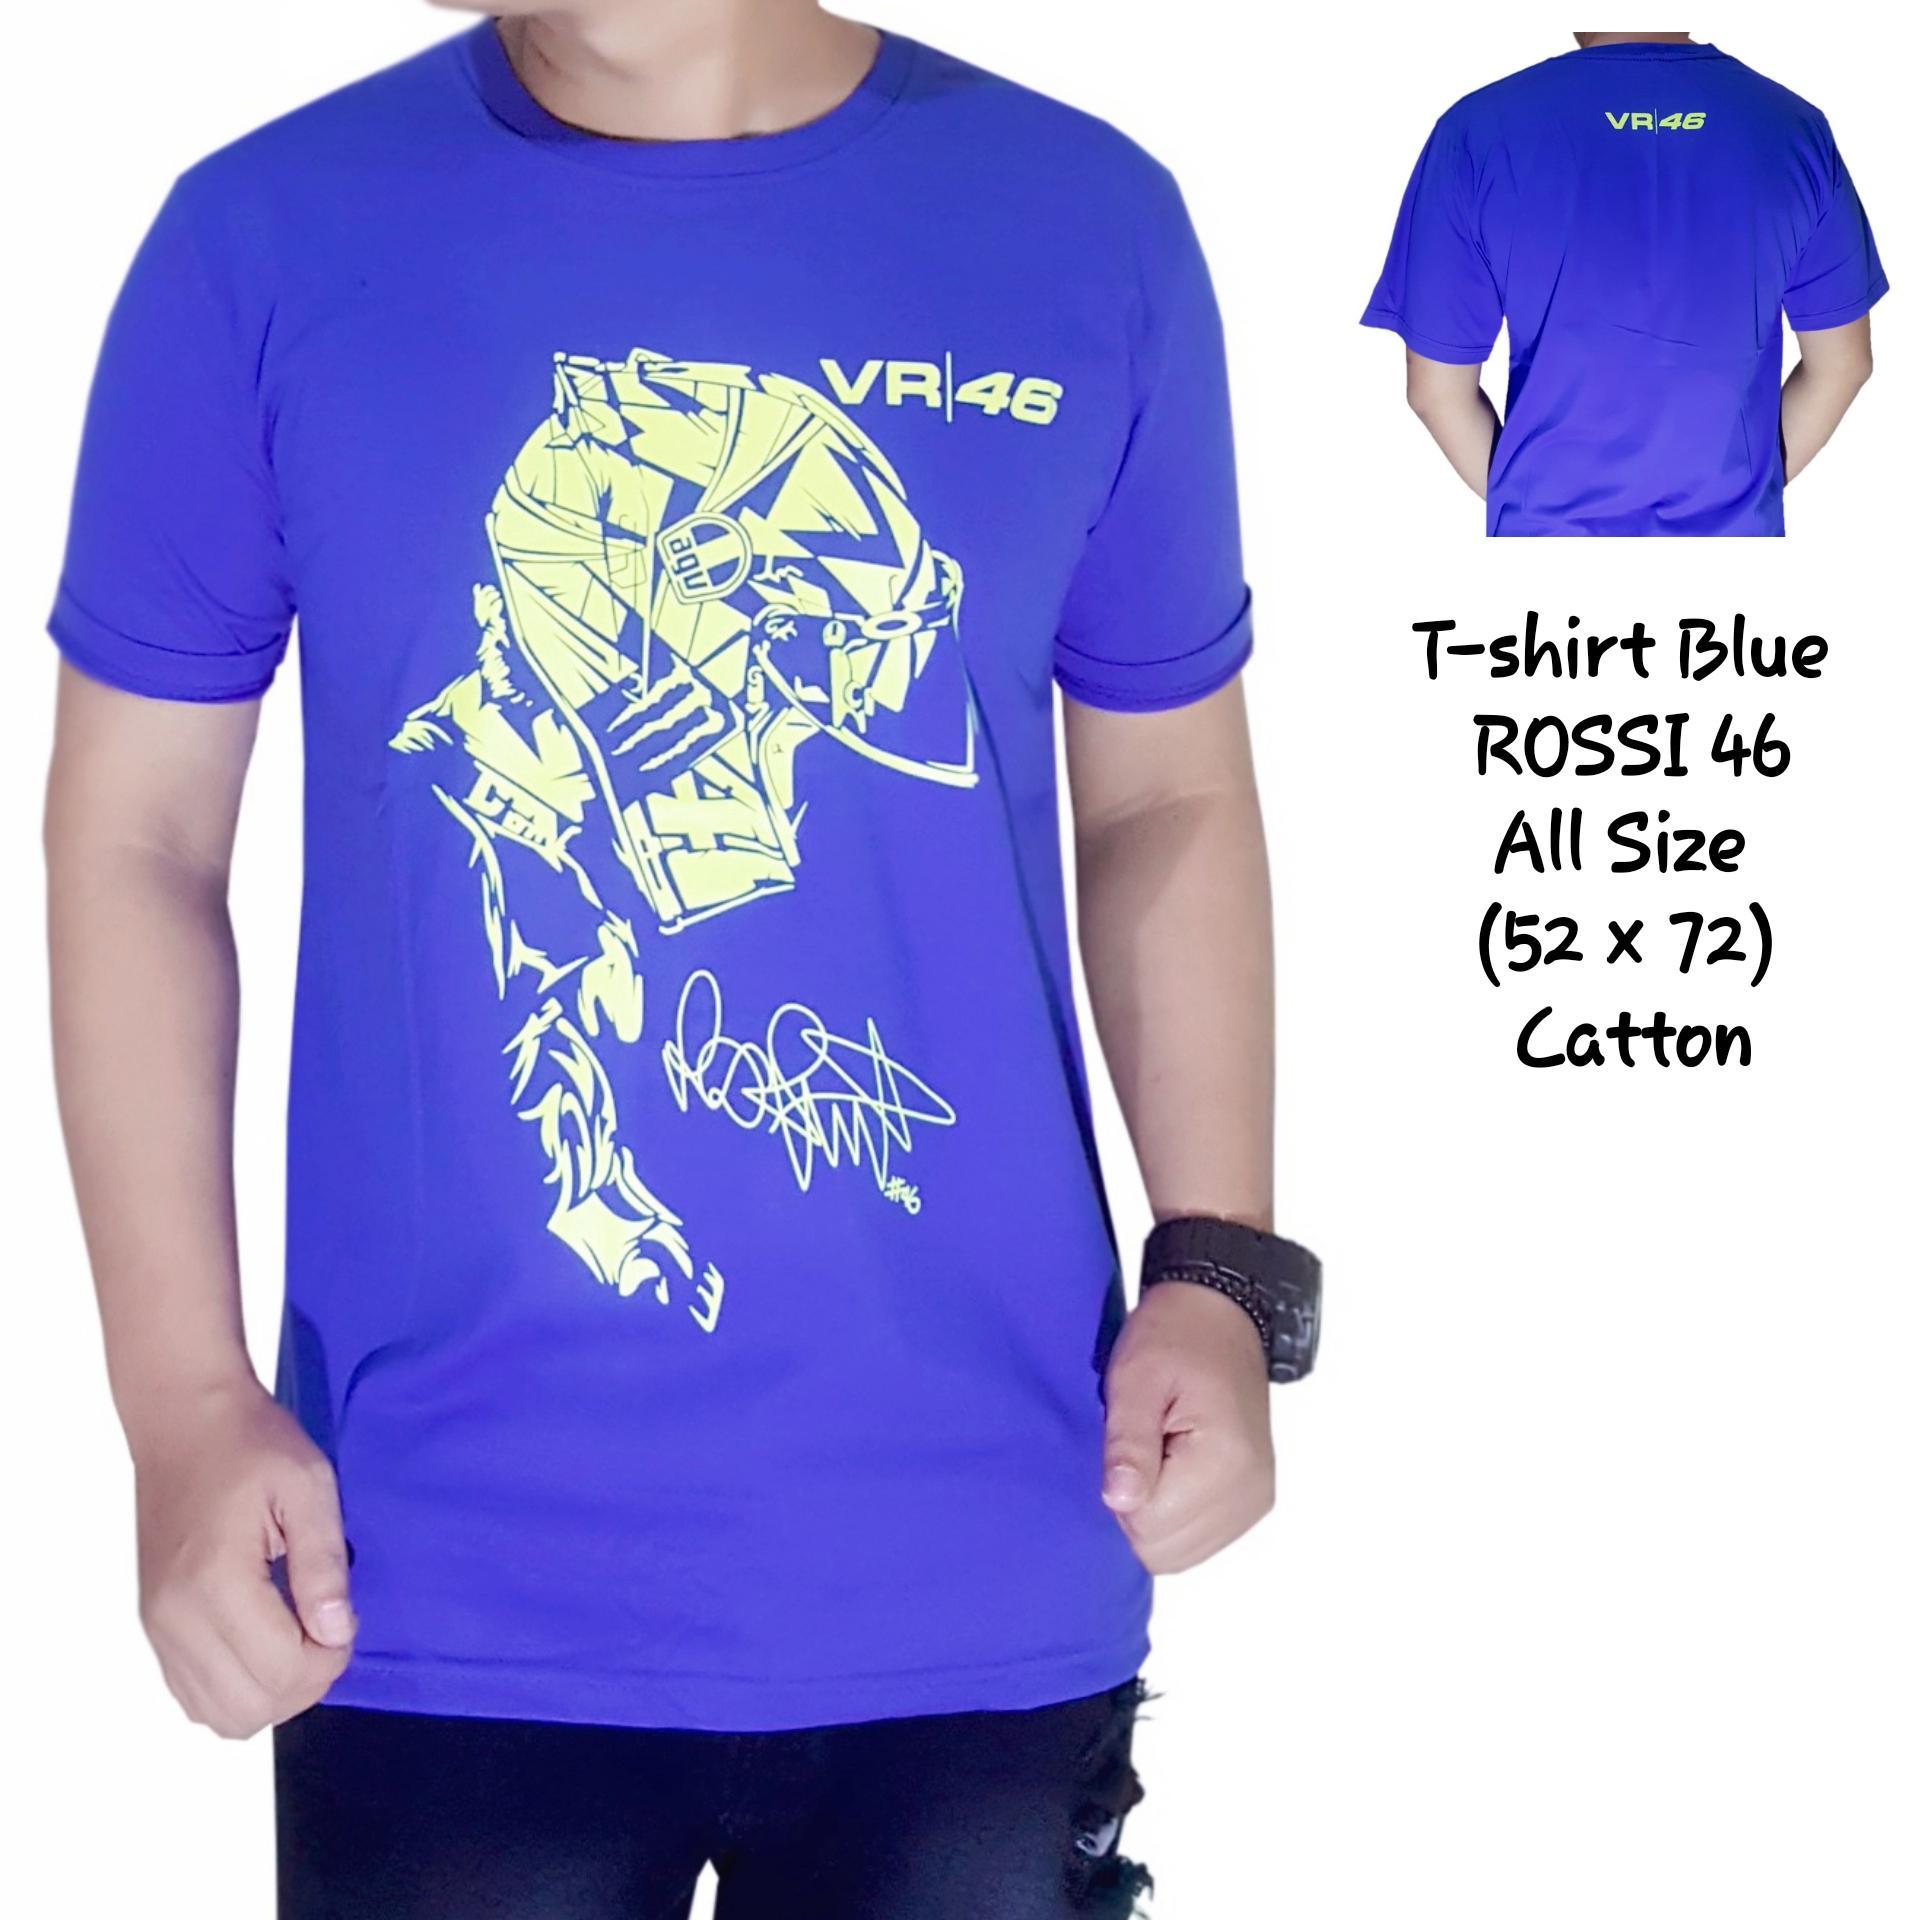 Anugrah - kaos distro T-shirt Fashion 100% soft cotton combed 30s premium pria